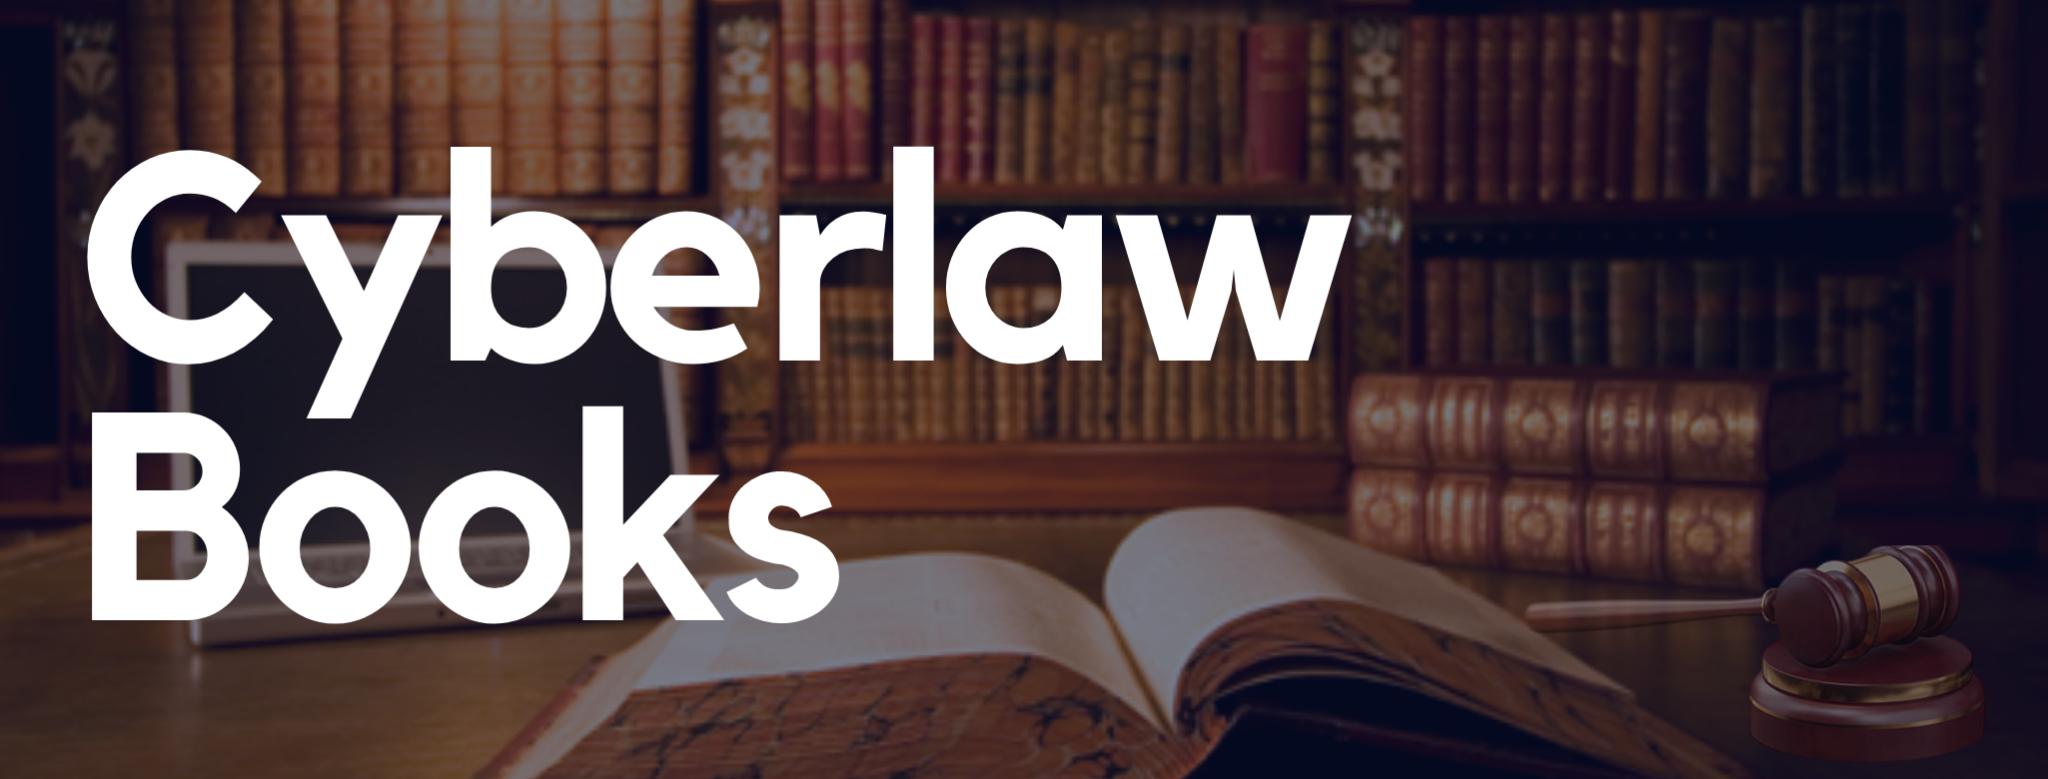 Cyber Law Books